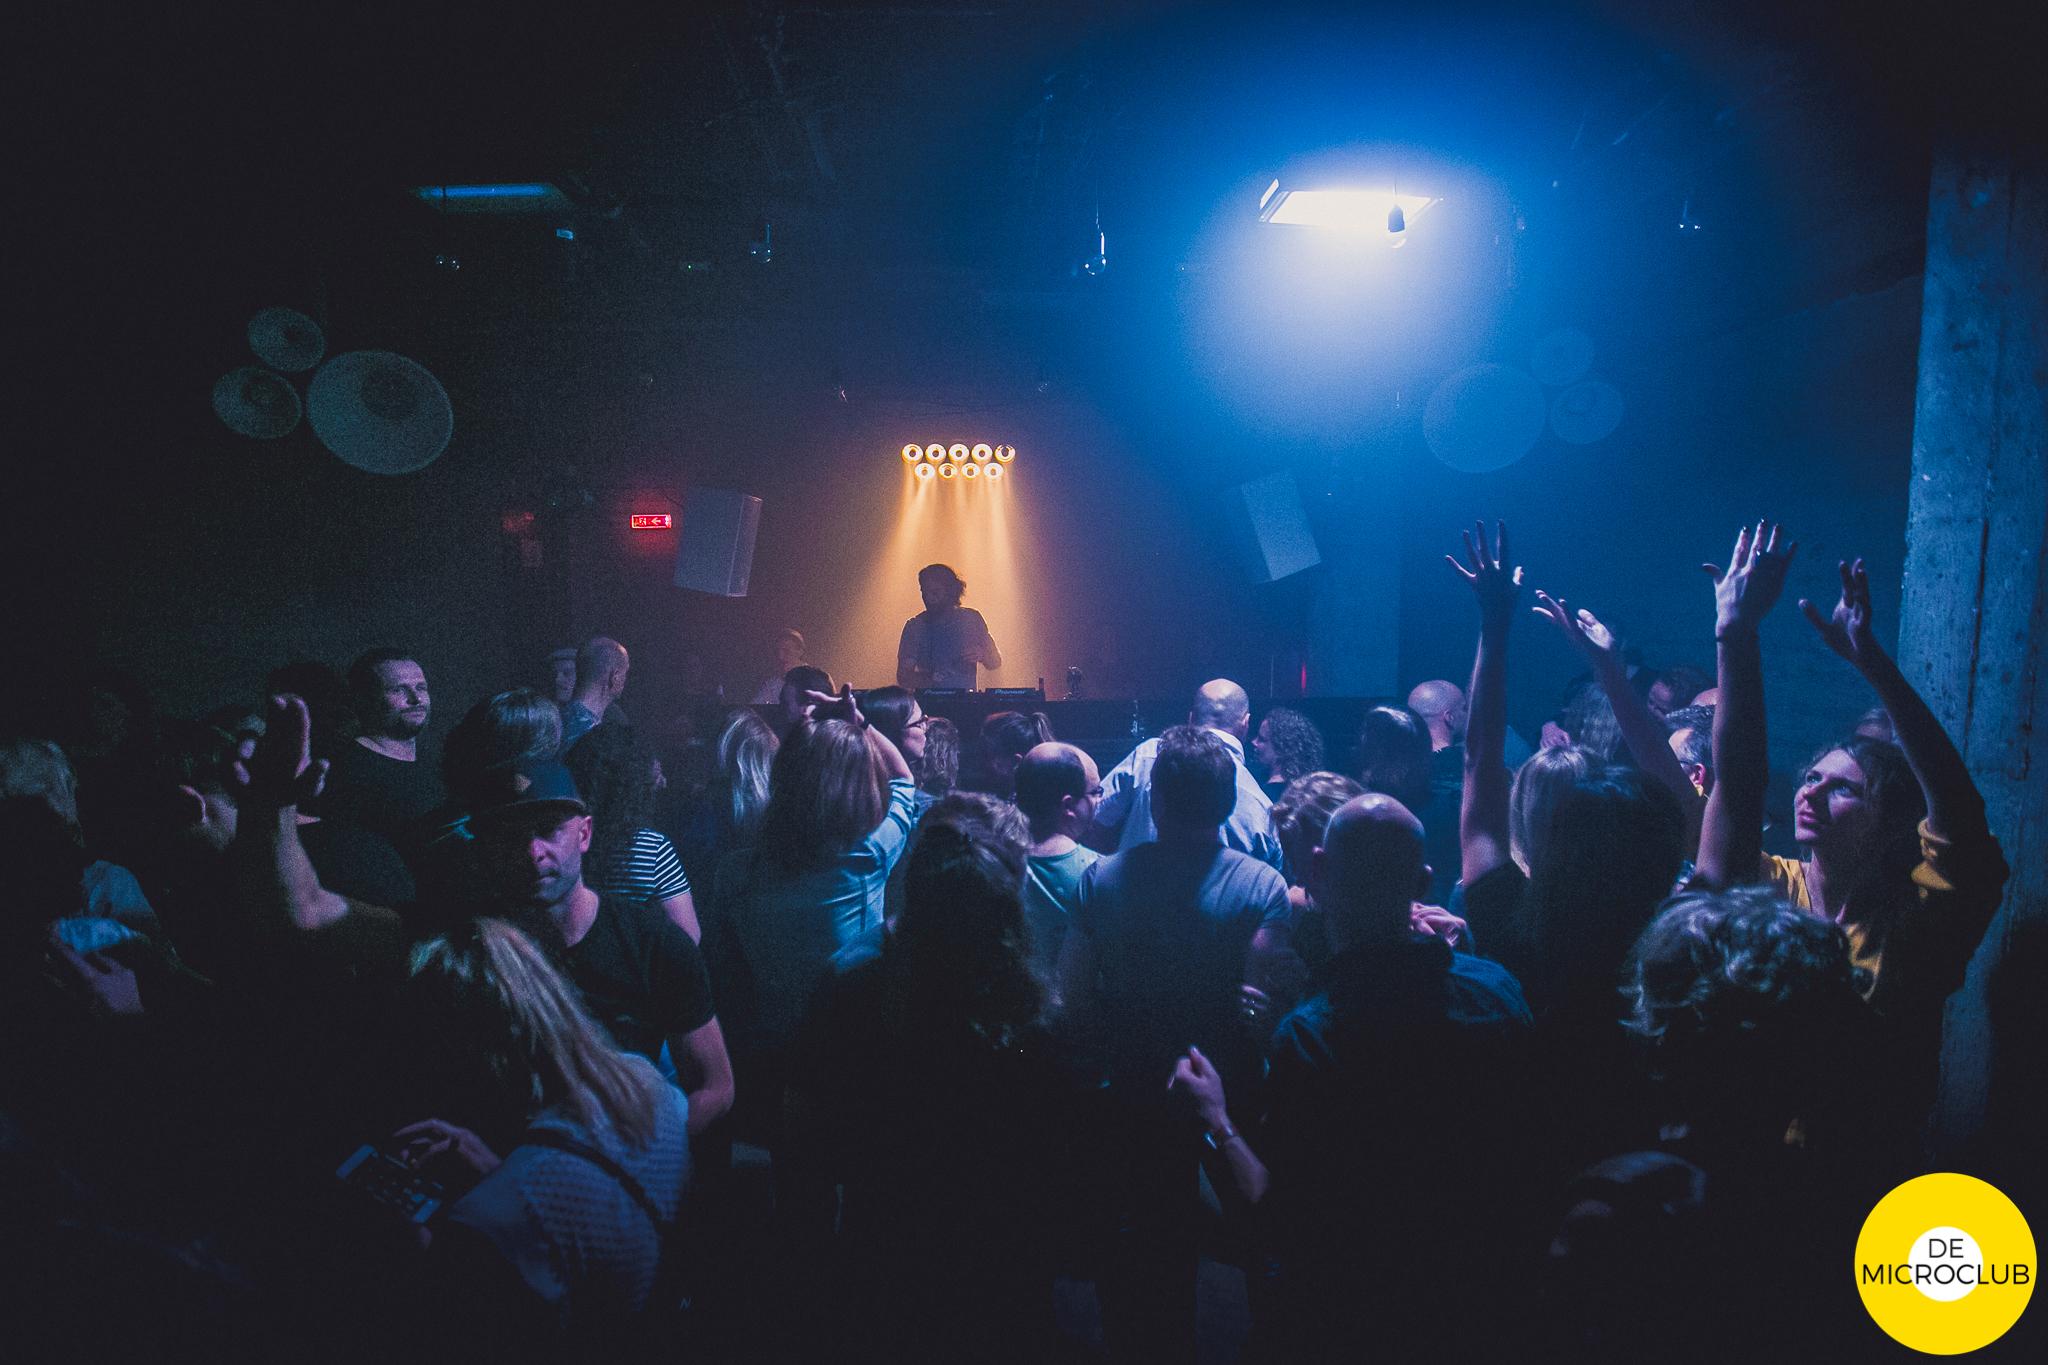 Microclub x Basis